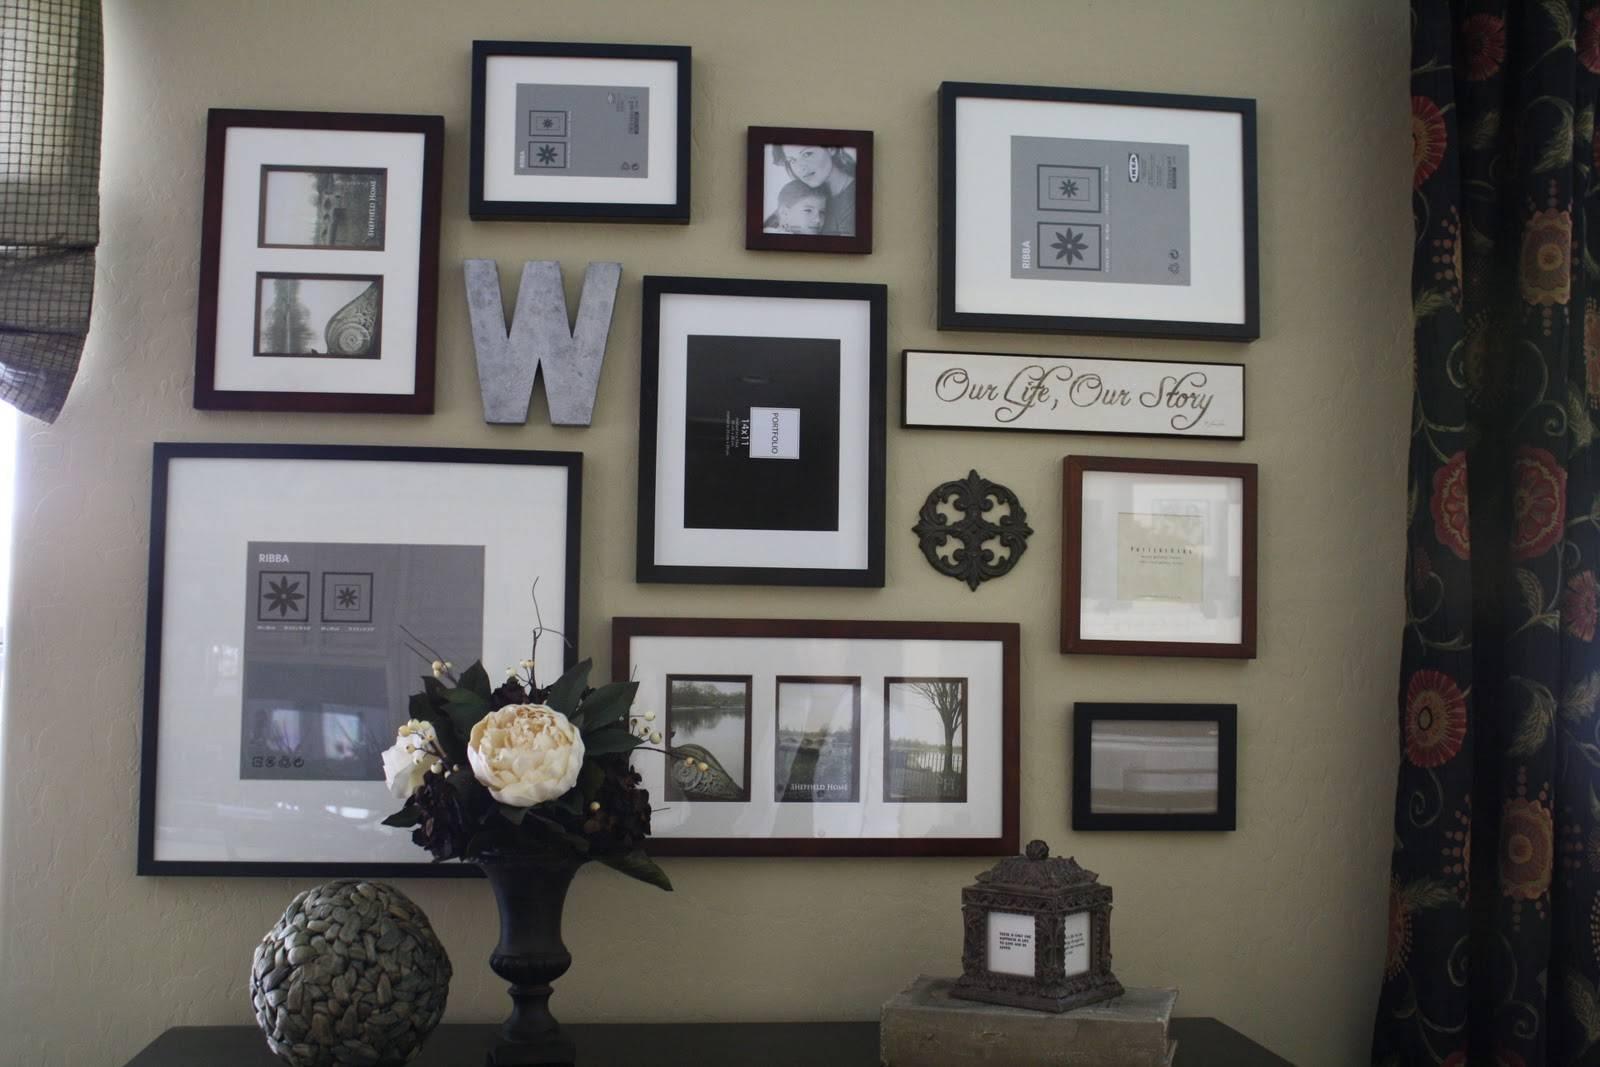 Splendid Diy Framed Wall Calendar Wall Decor Fretwork Square Inside 2018 Black And White Framed Wall Art (View 8 of 20)